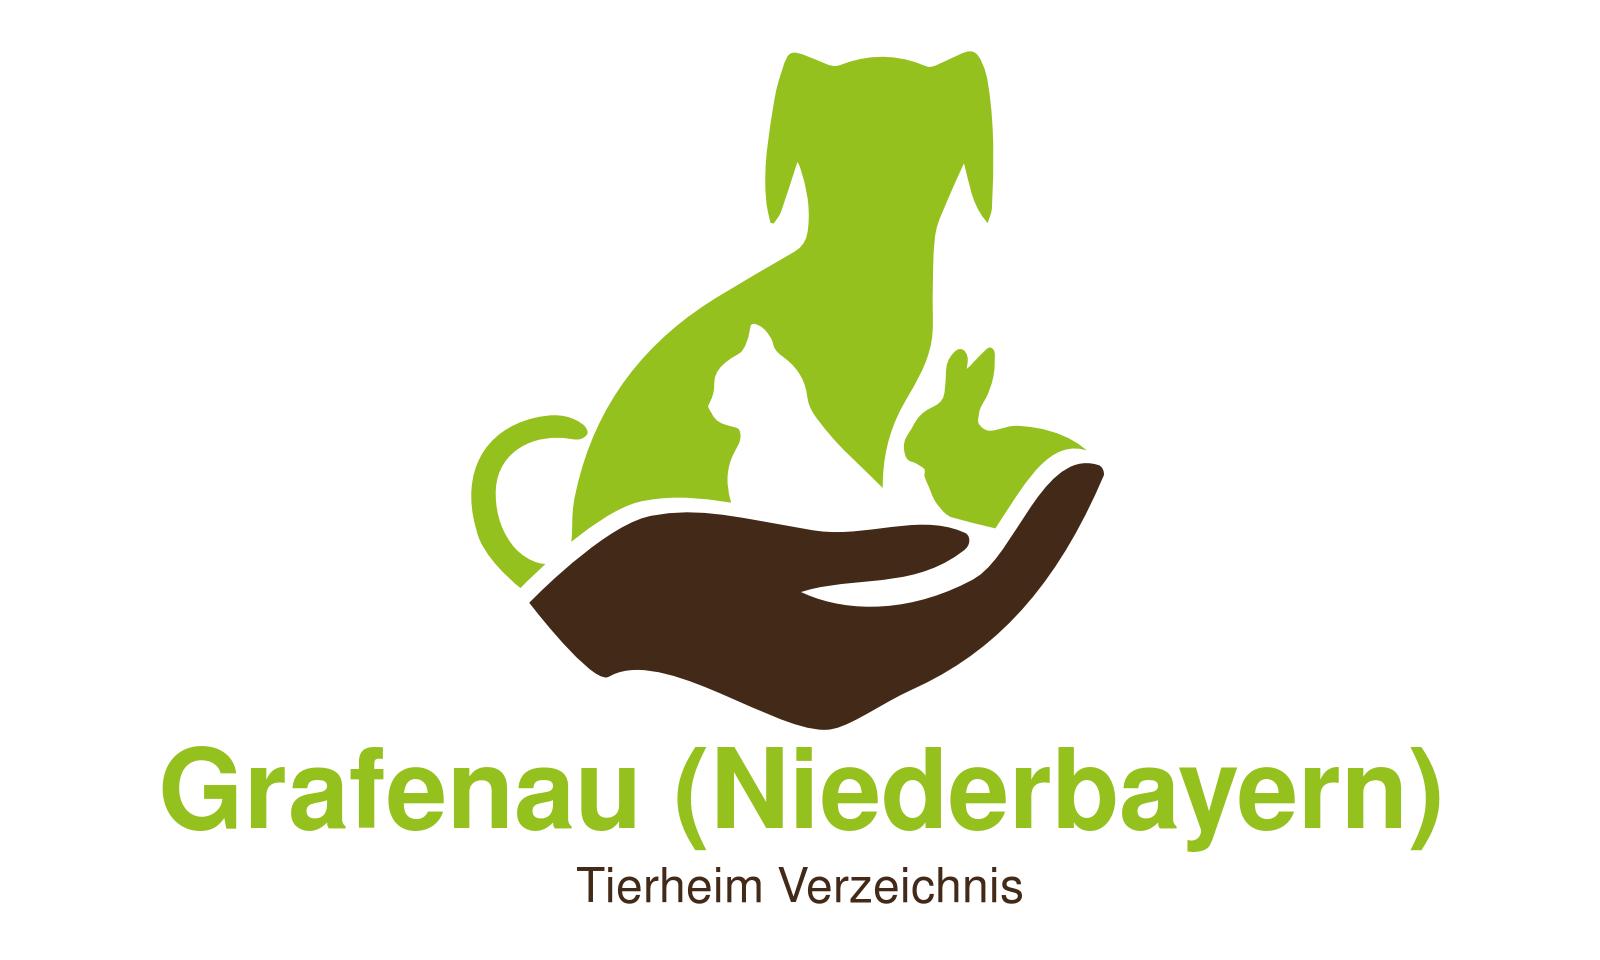 Tierheim Grafenau (Niederbayern)